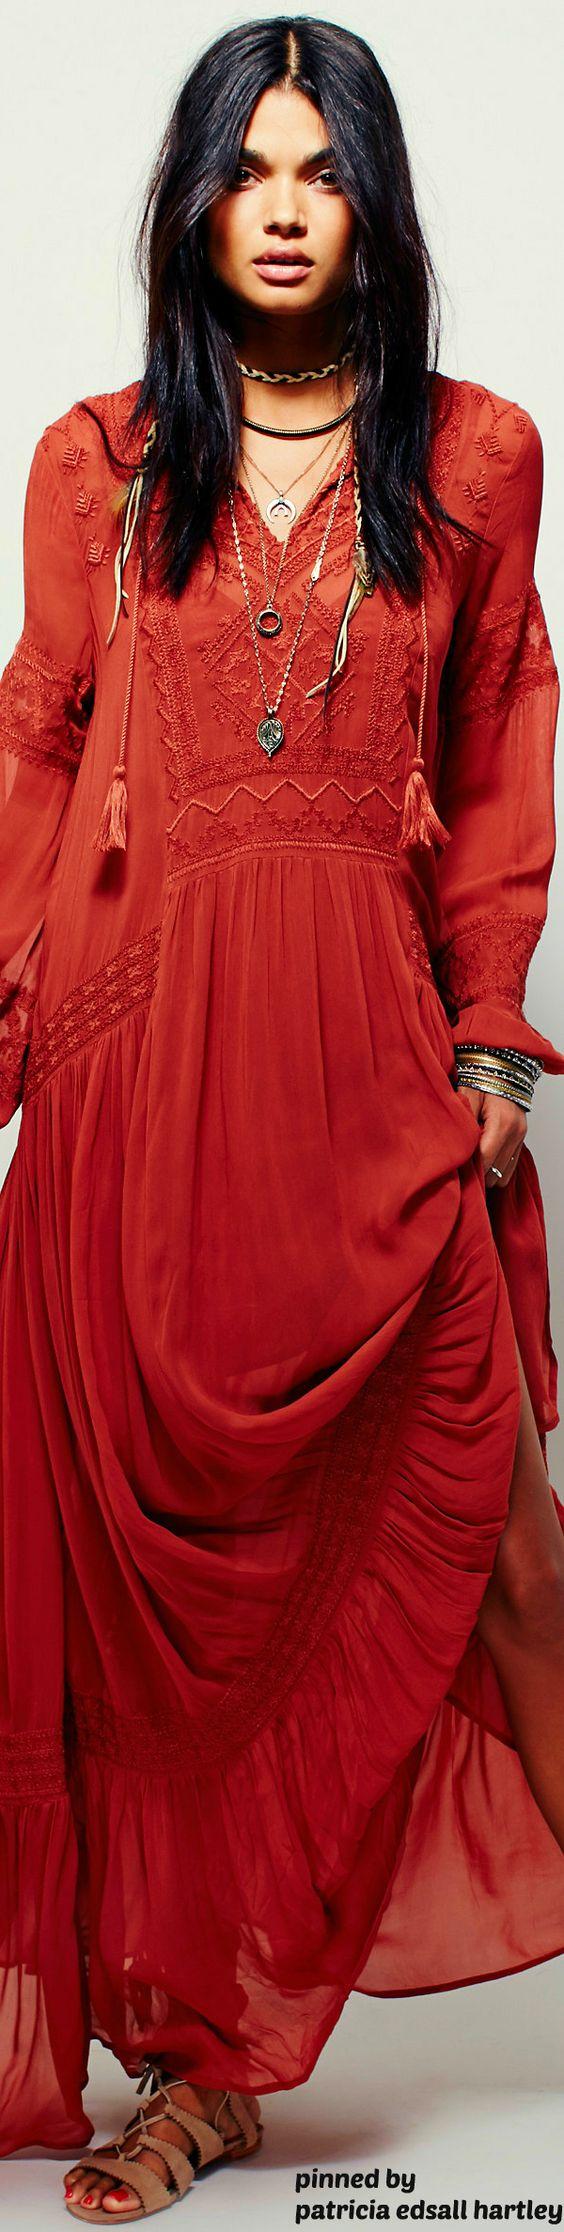 #fashion #boho #bohemian: